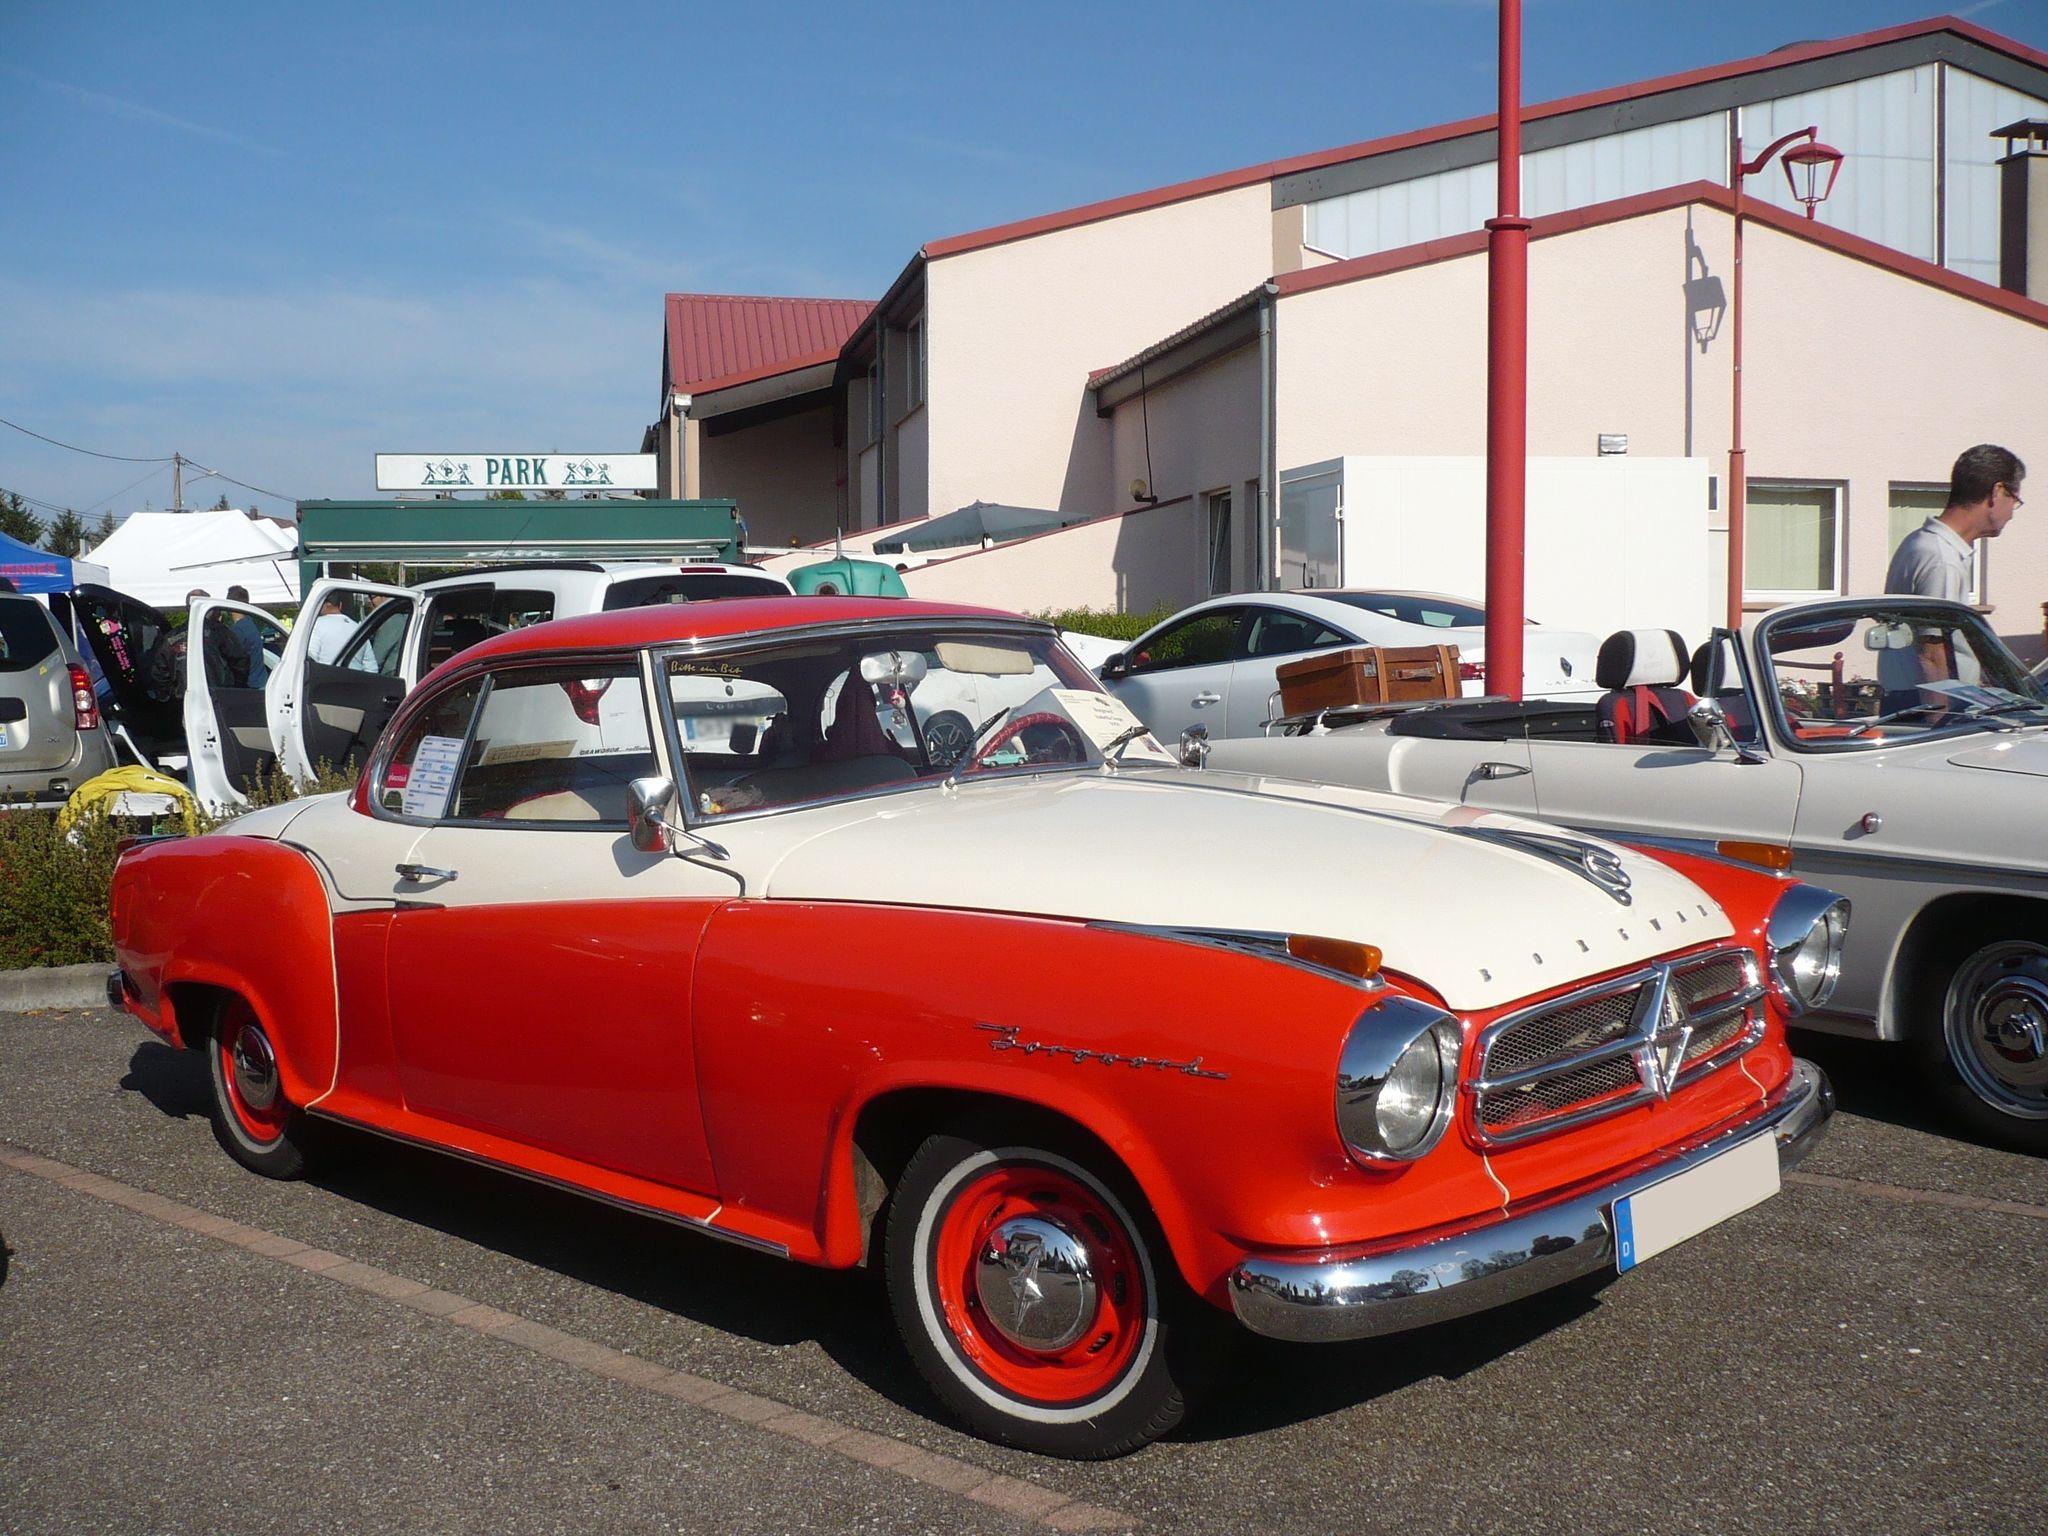 BORGWARD Isabella coupé 1959 Hambach (1)